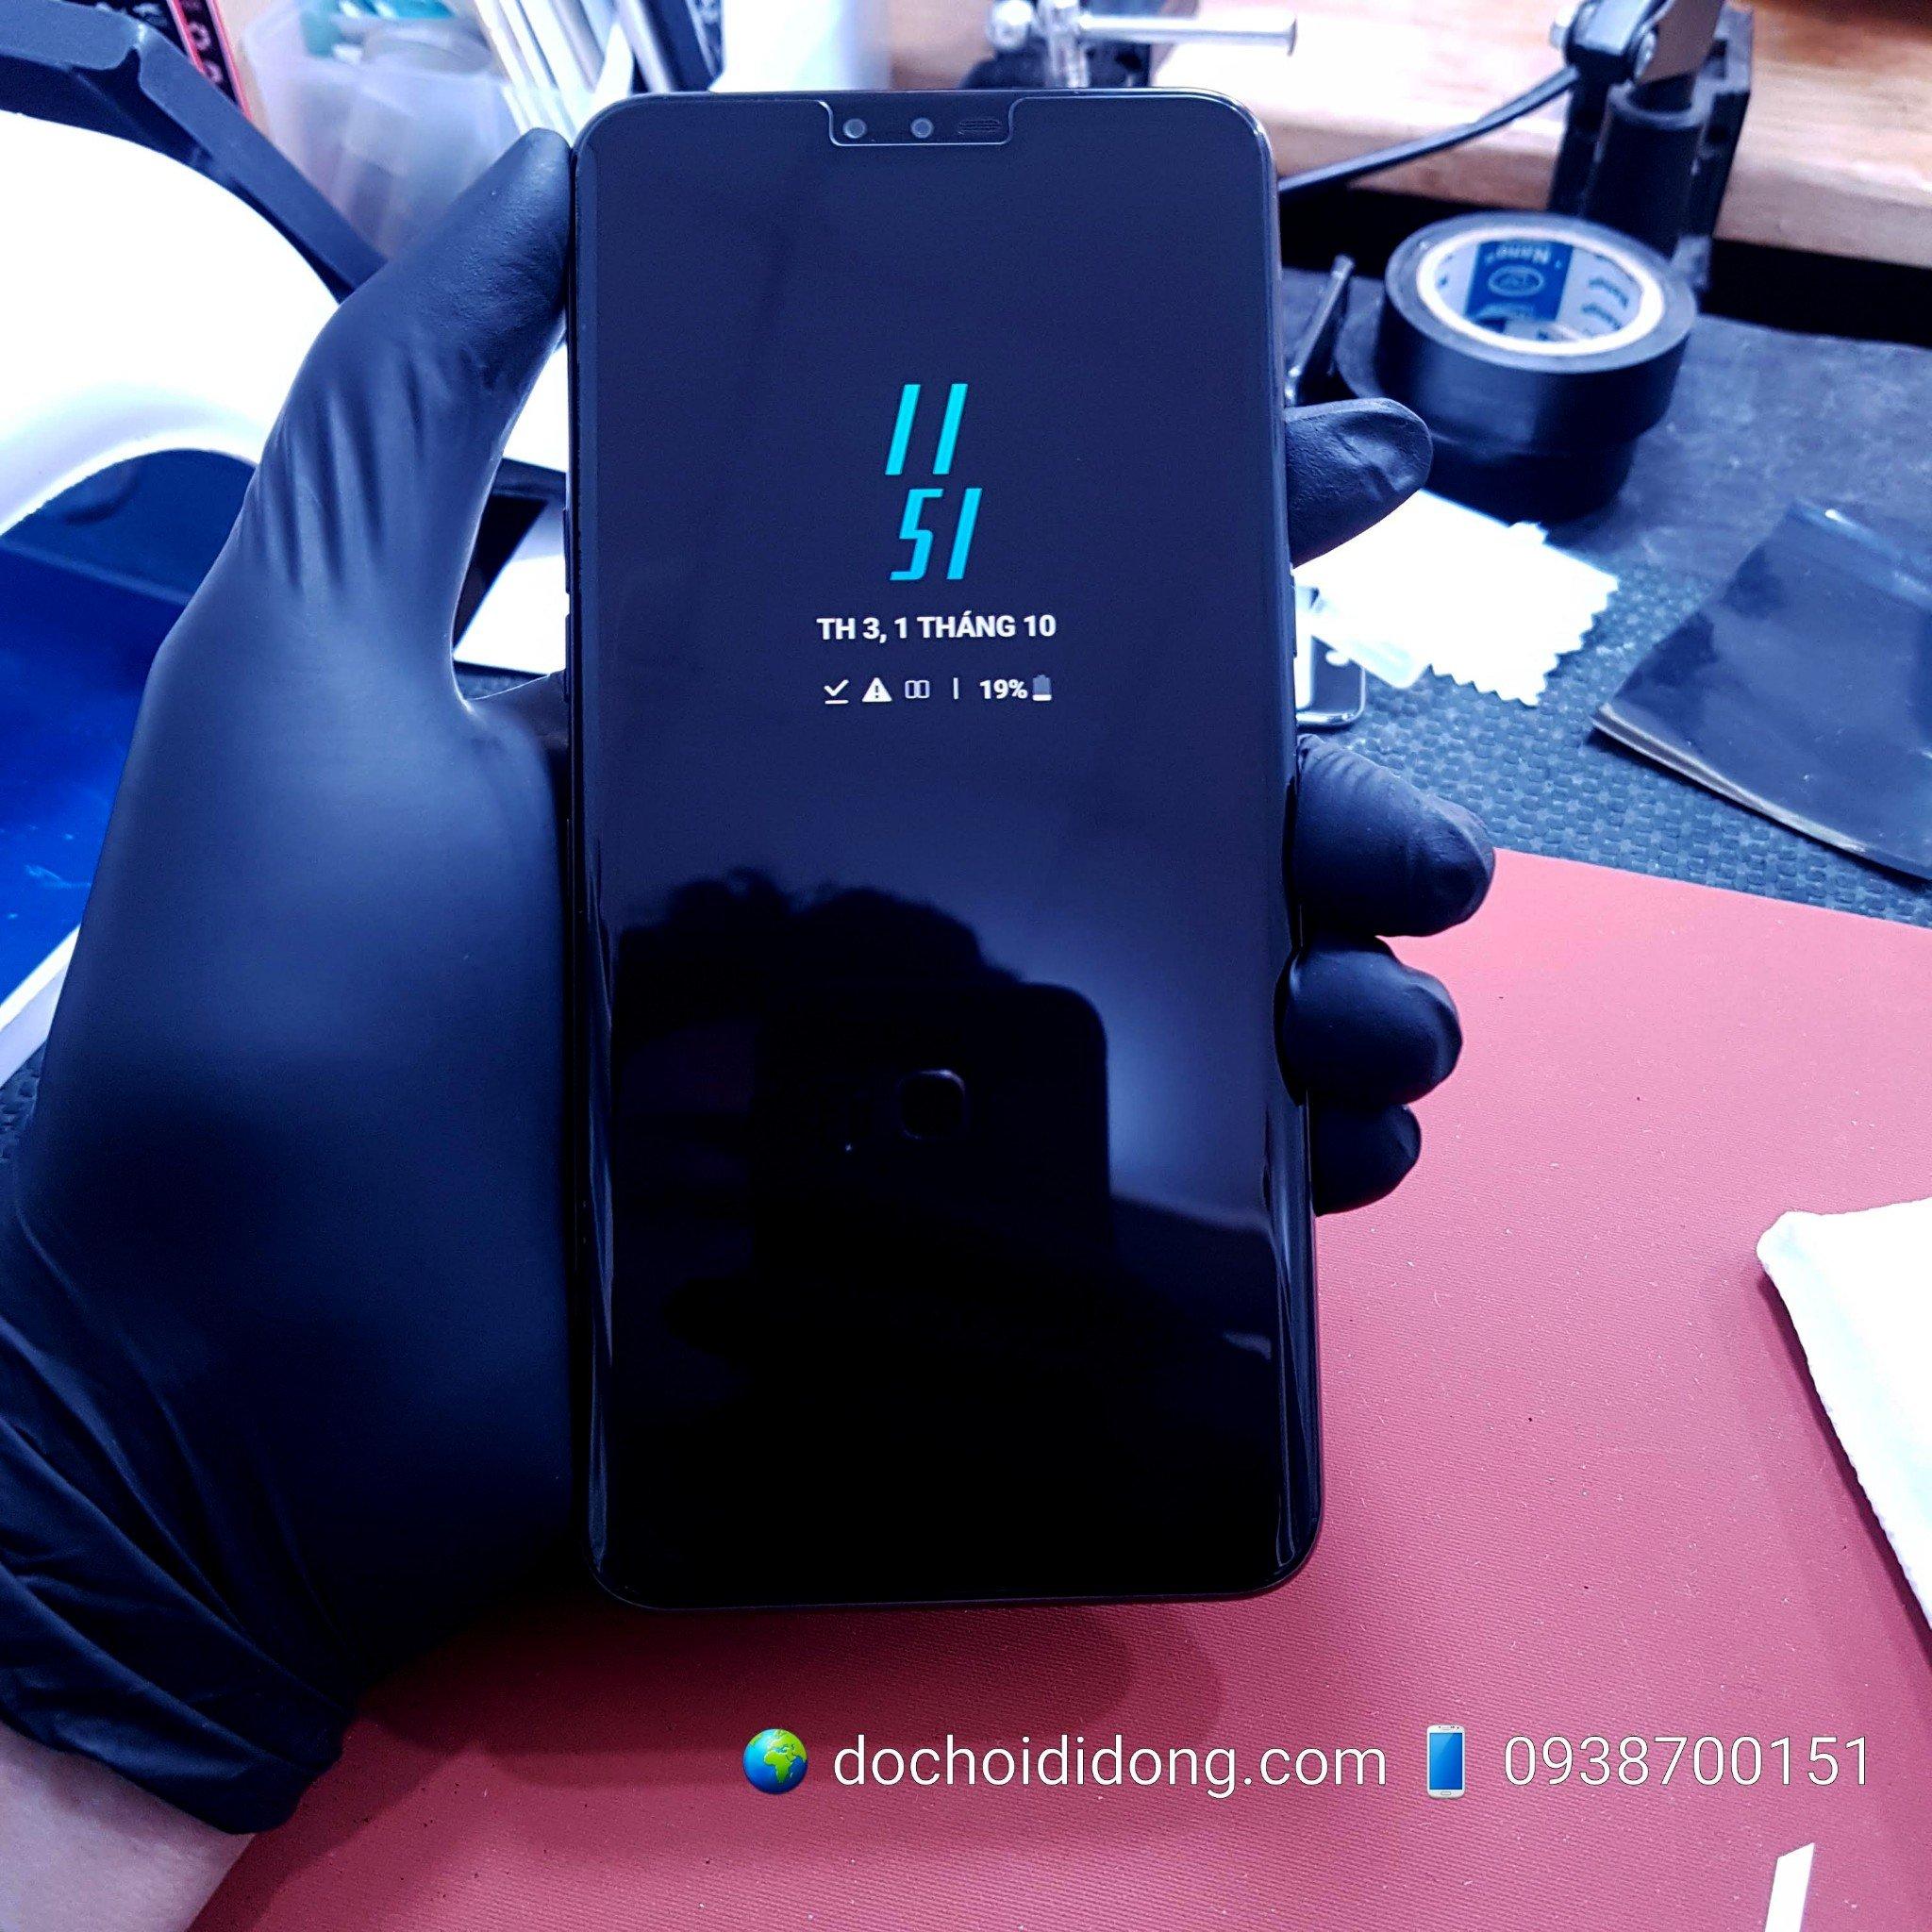 mieng-dan-cuong-luc-lg-v50-zacase-keo-uv-cao-cap